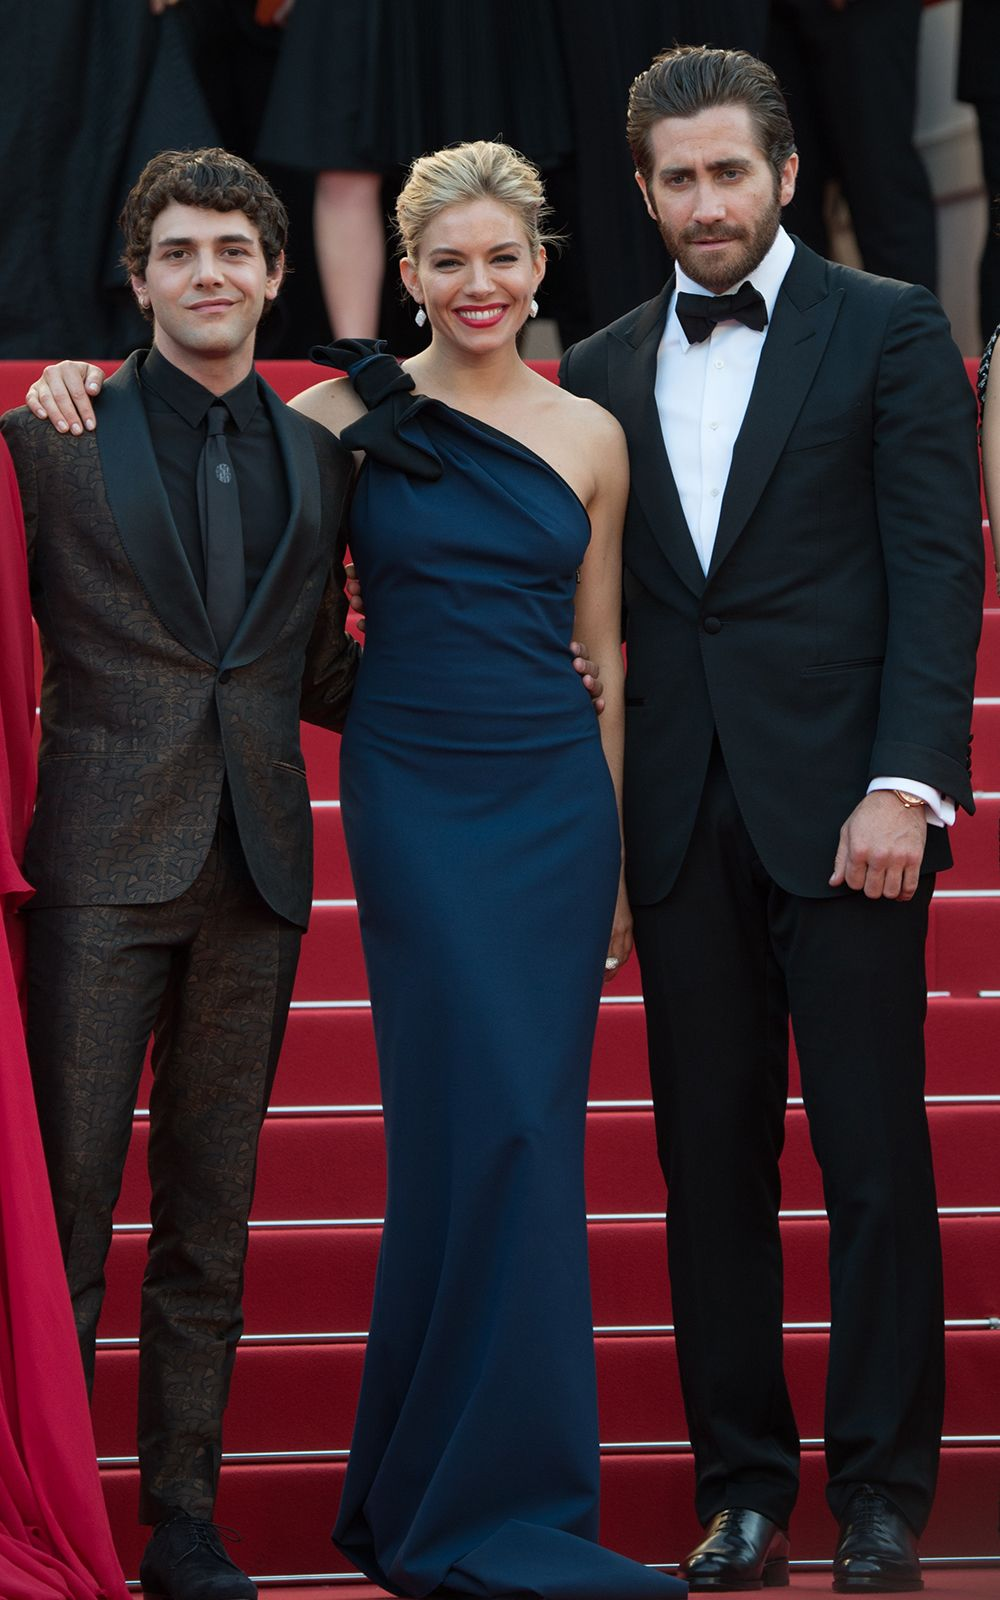 Festival de Filme de Cannes  2015: Tapete Vermelho   Harper's Bazaar